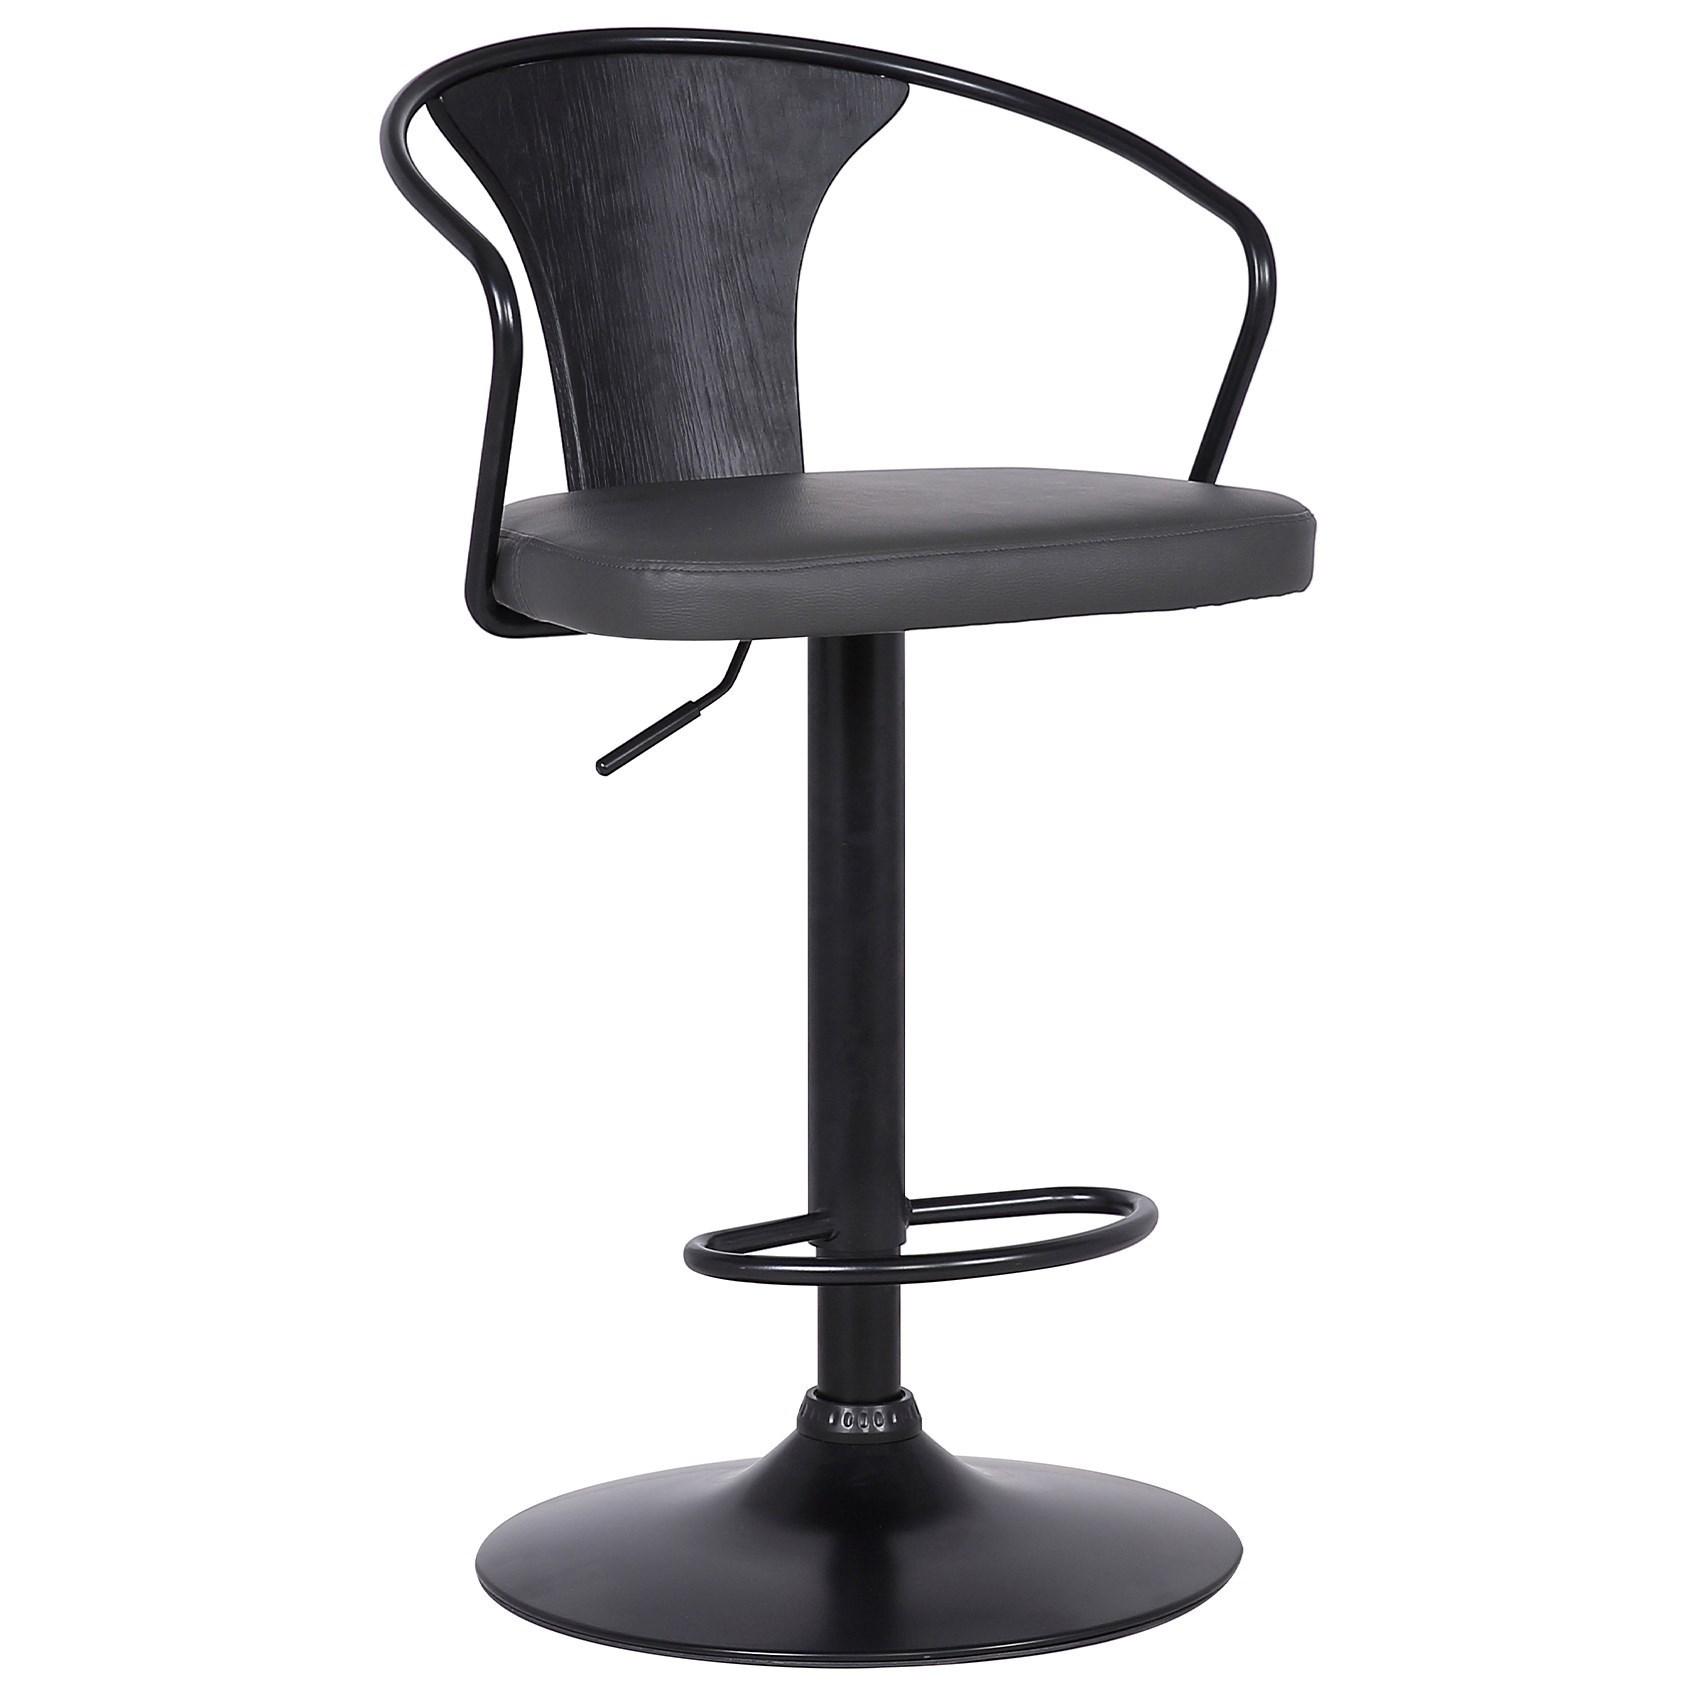 Eagle Contemporary Adjustable Barstool by Armen Living at Michael Alan Furniture & Design